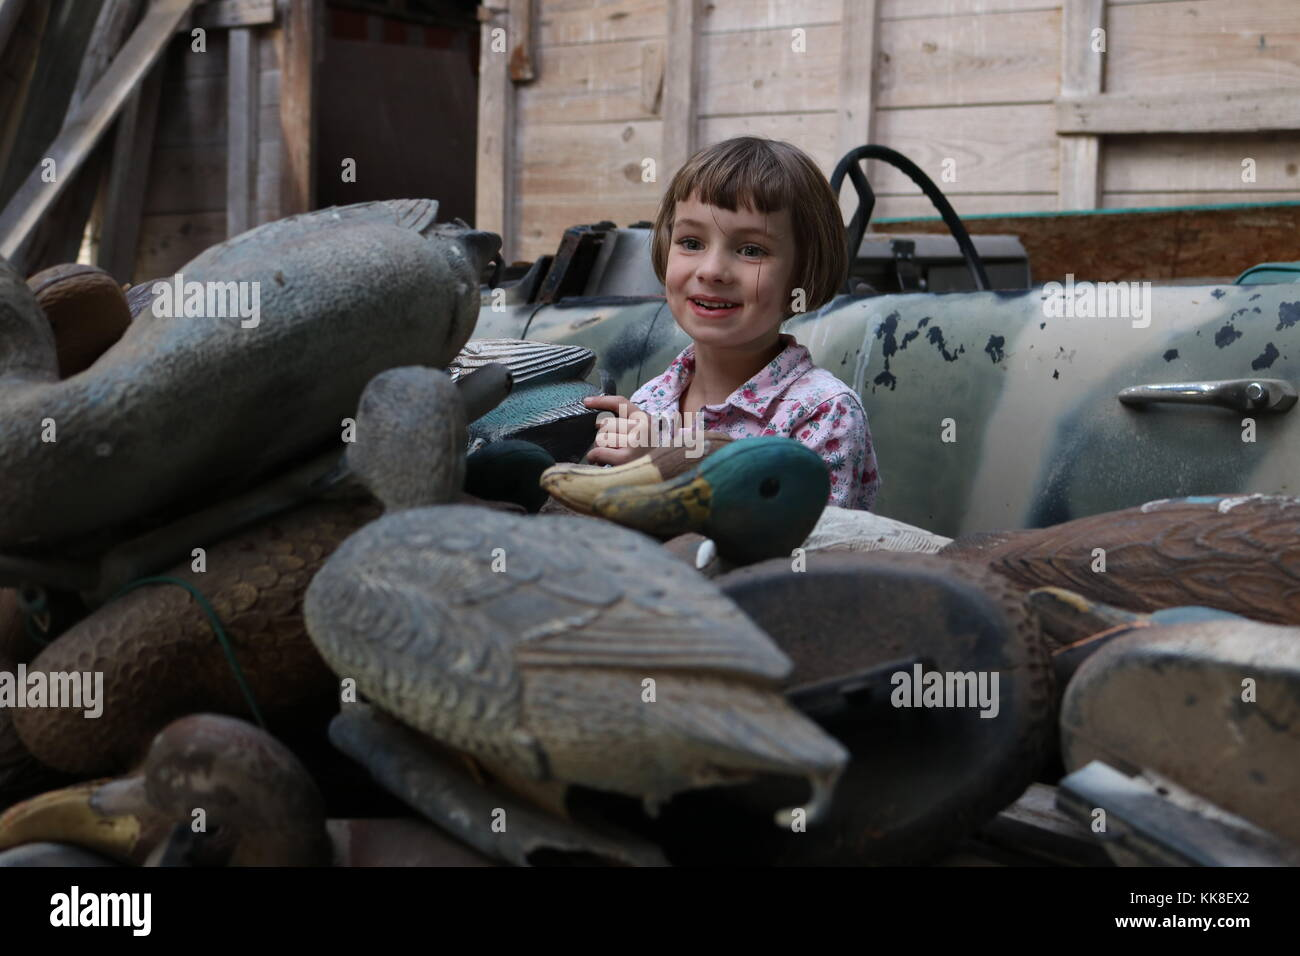 Duck Decoys Stock Photos & Duck Decoys Stock Images - Alamy - photo#24